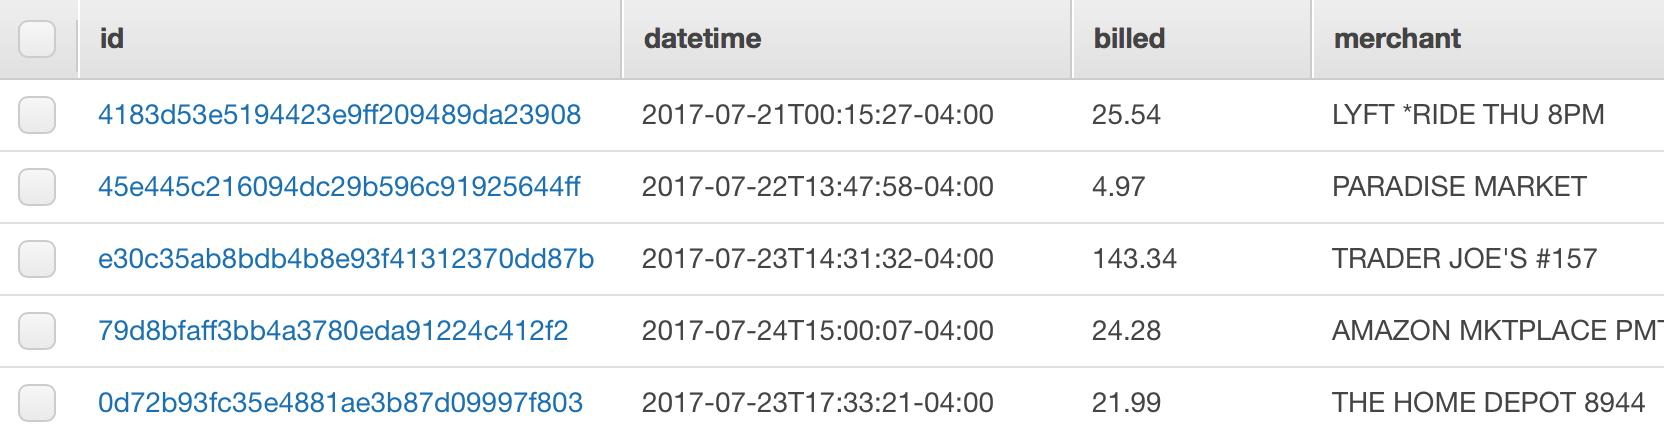 Простой трекер семейного бюджета с помощью AWS SES, Lambda и DynamoDB (и Route53) - 3